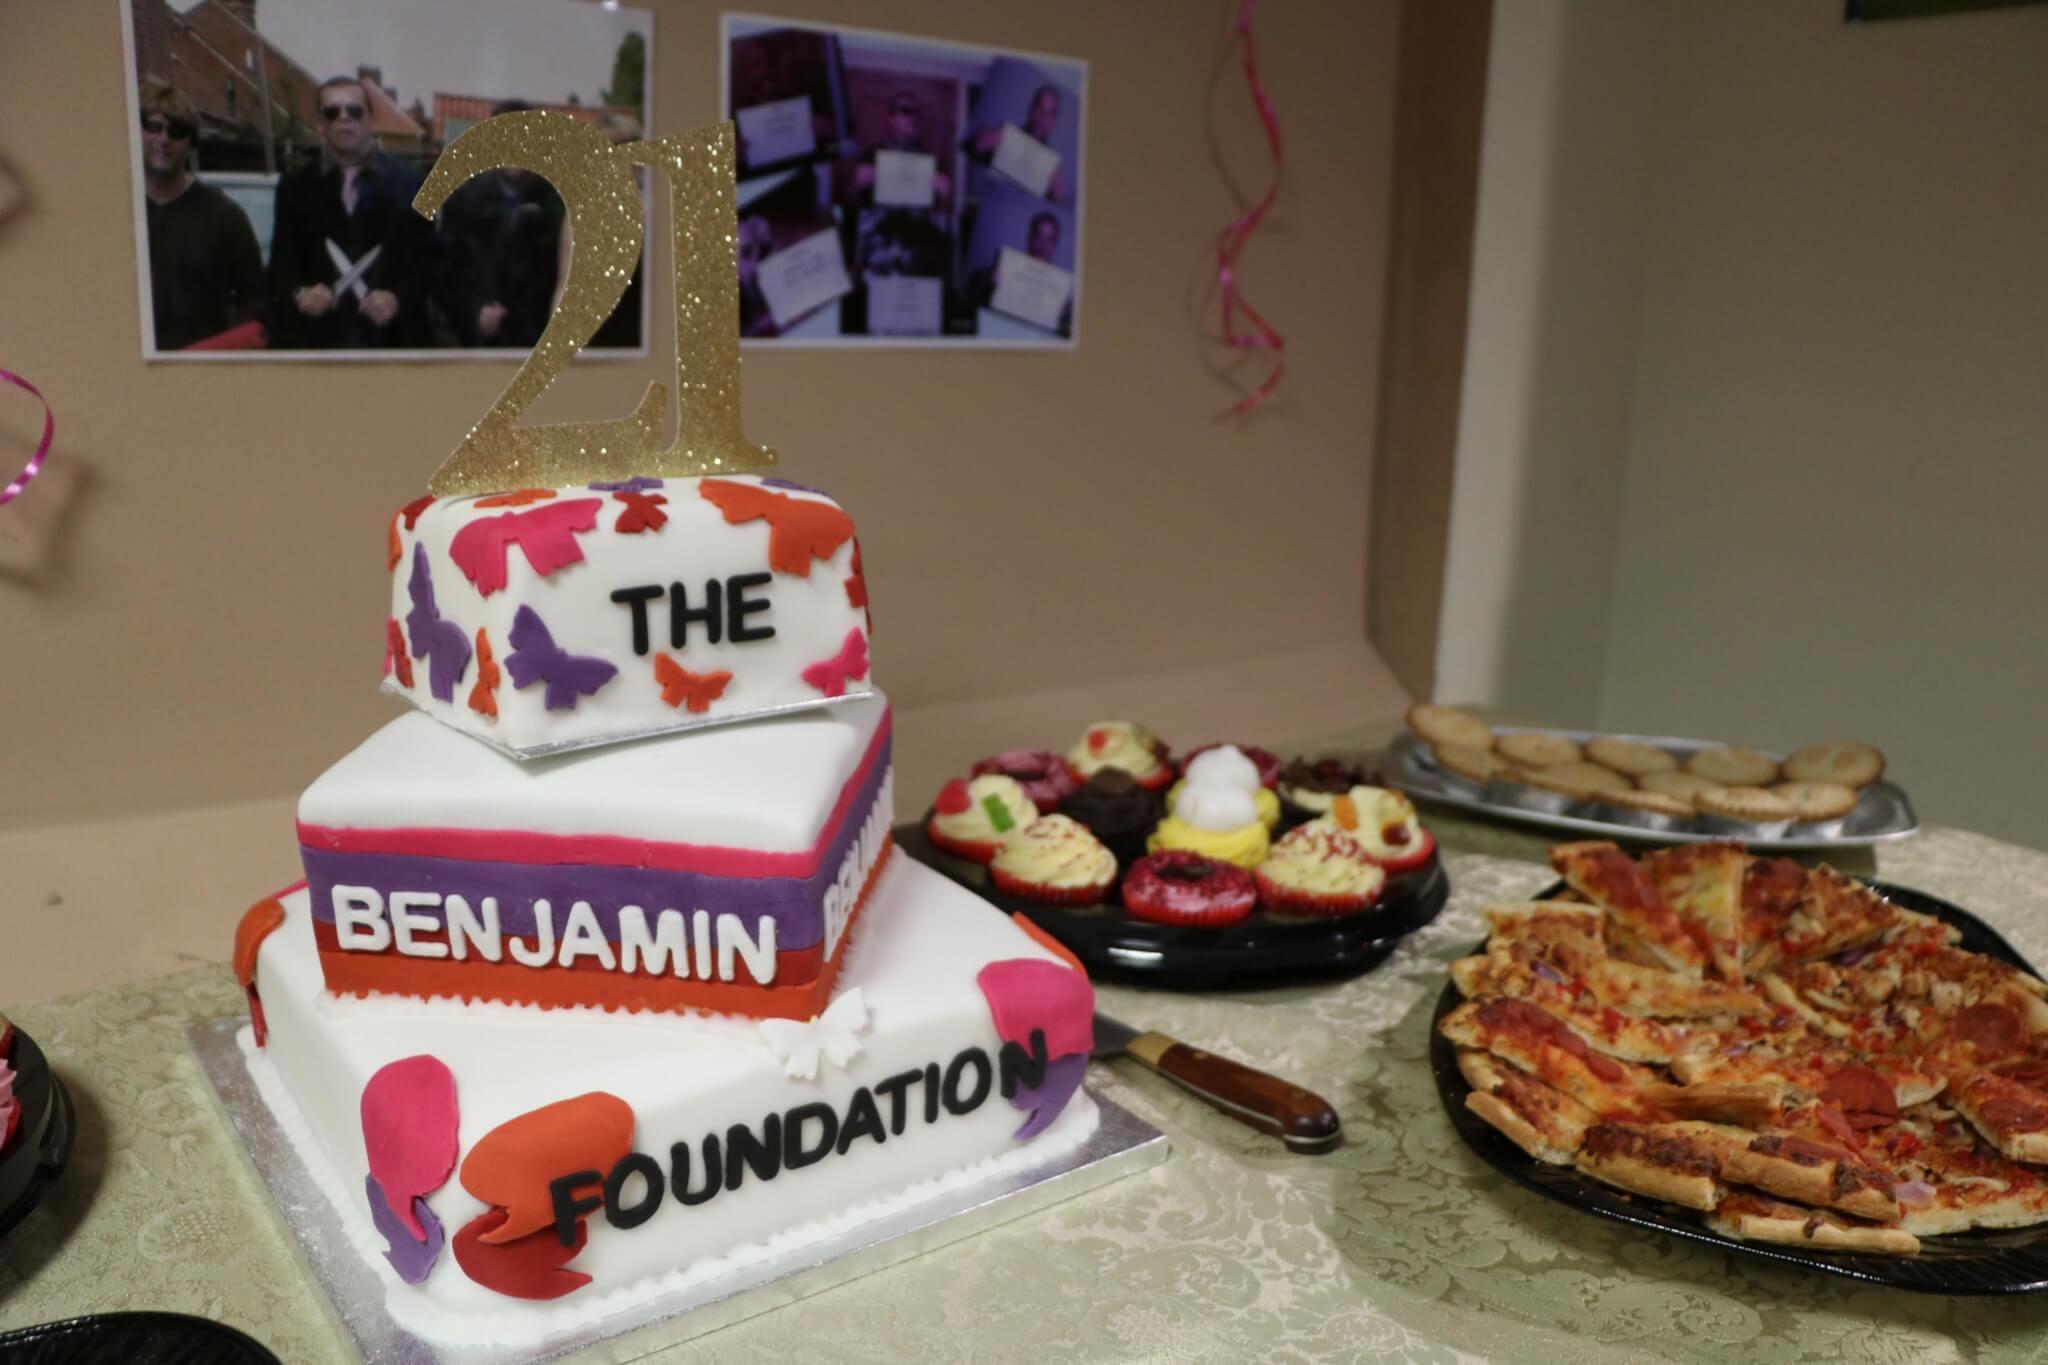 Winston Court's 21st birthday cake